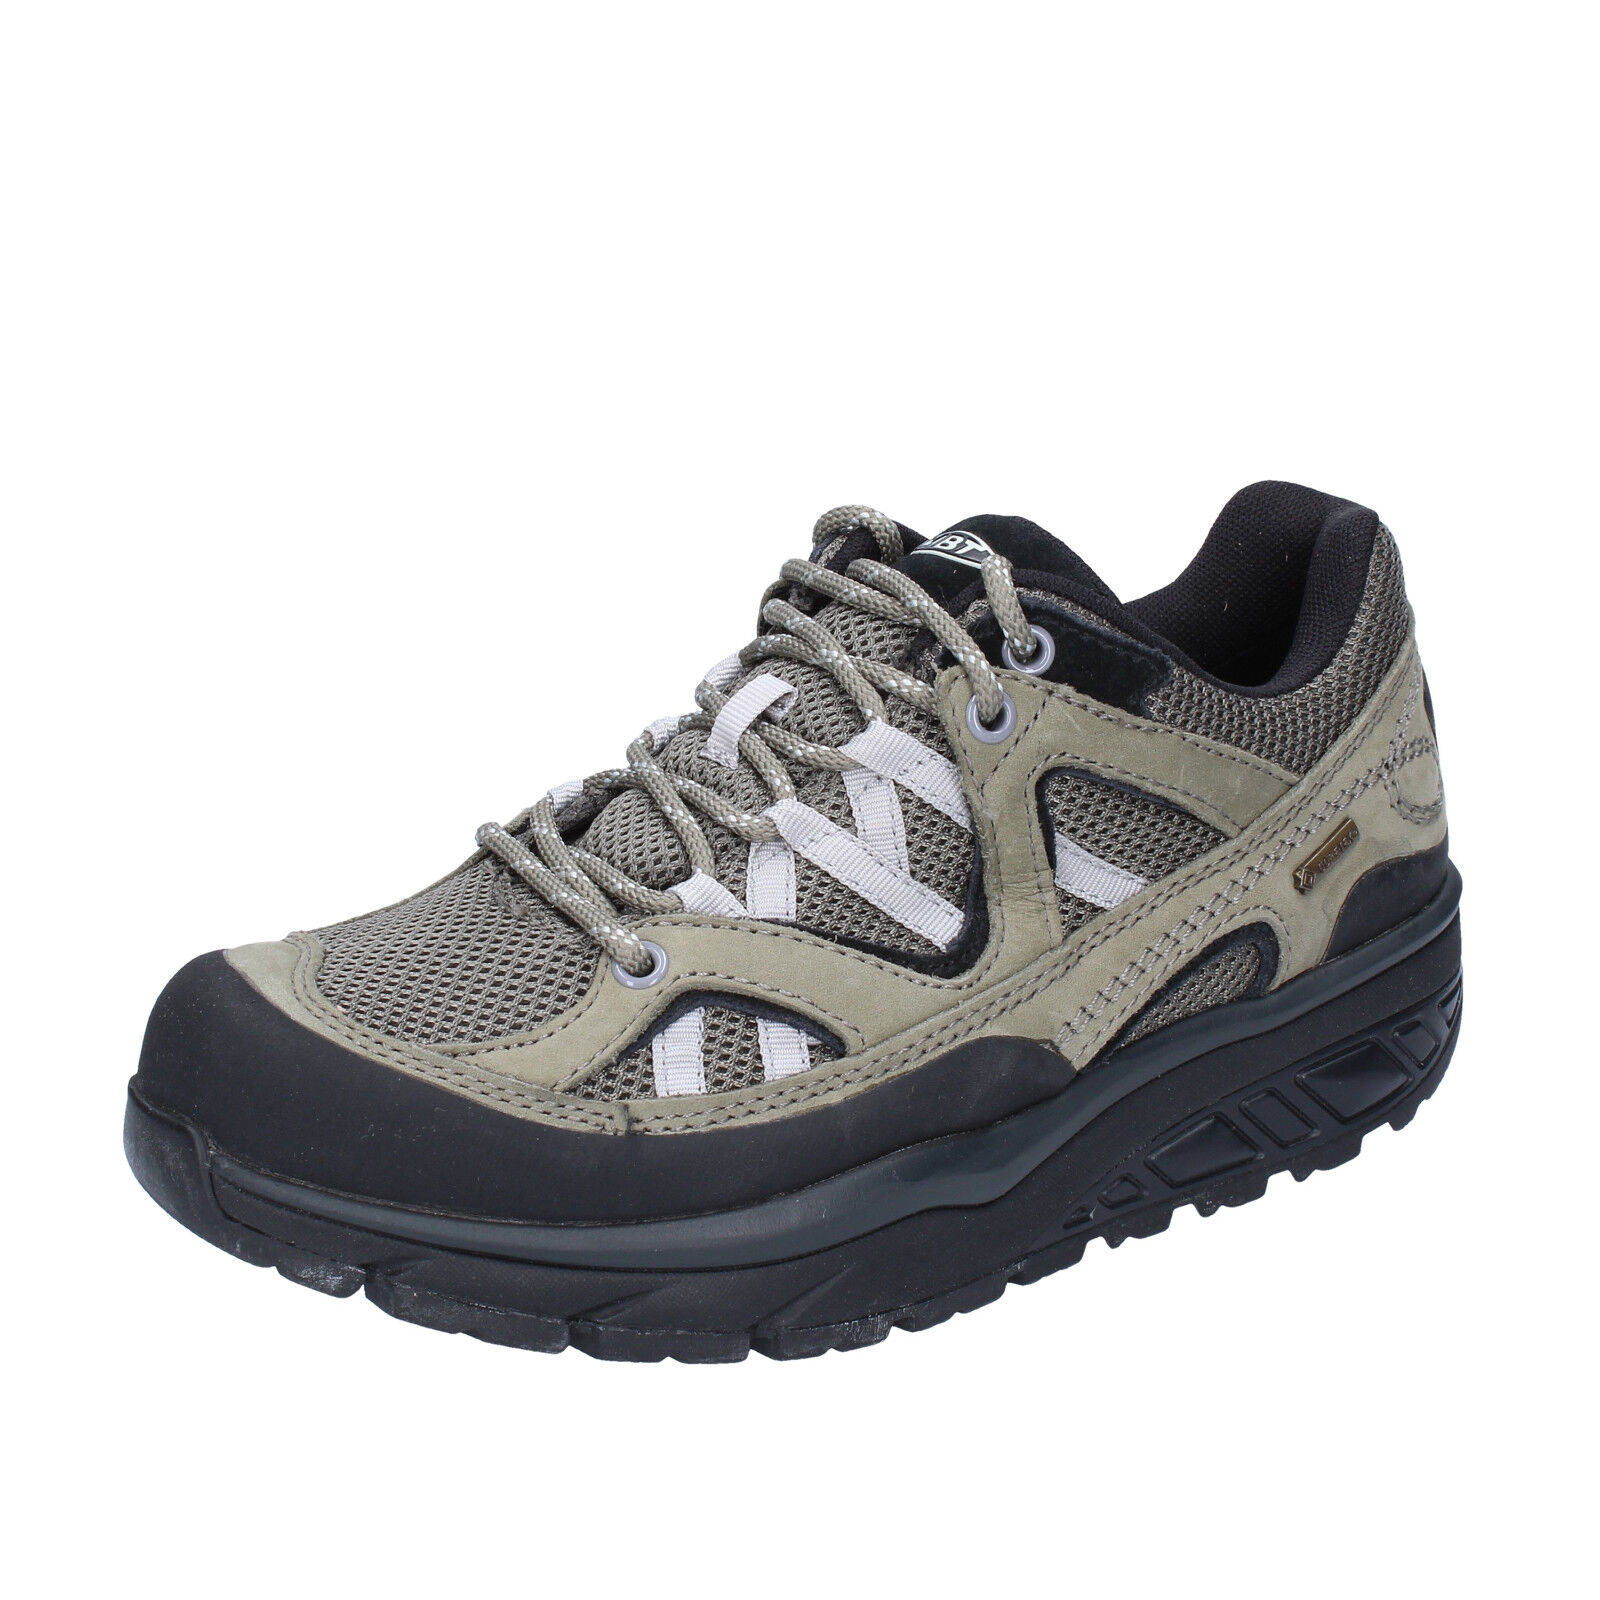 Scarpe donna MBT 35 EU scarpe da ginnastica verde grigio tessuto nabuk BT23-35   Economici Per    Uomini/Donna Scarpa